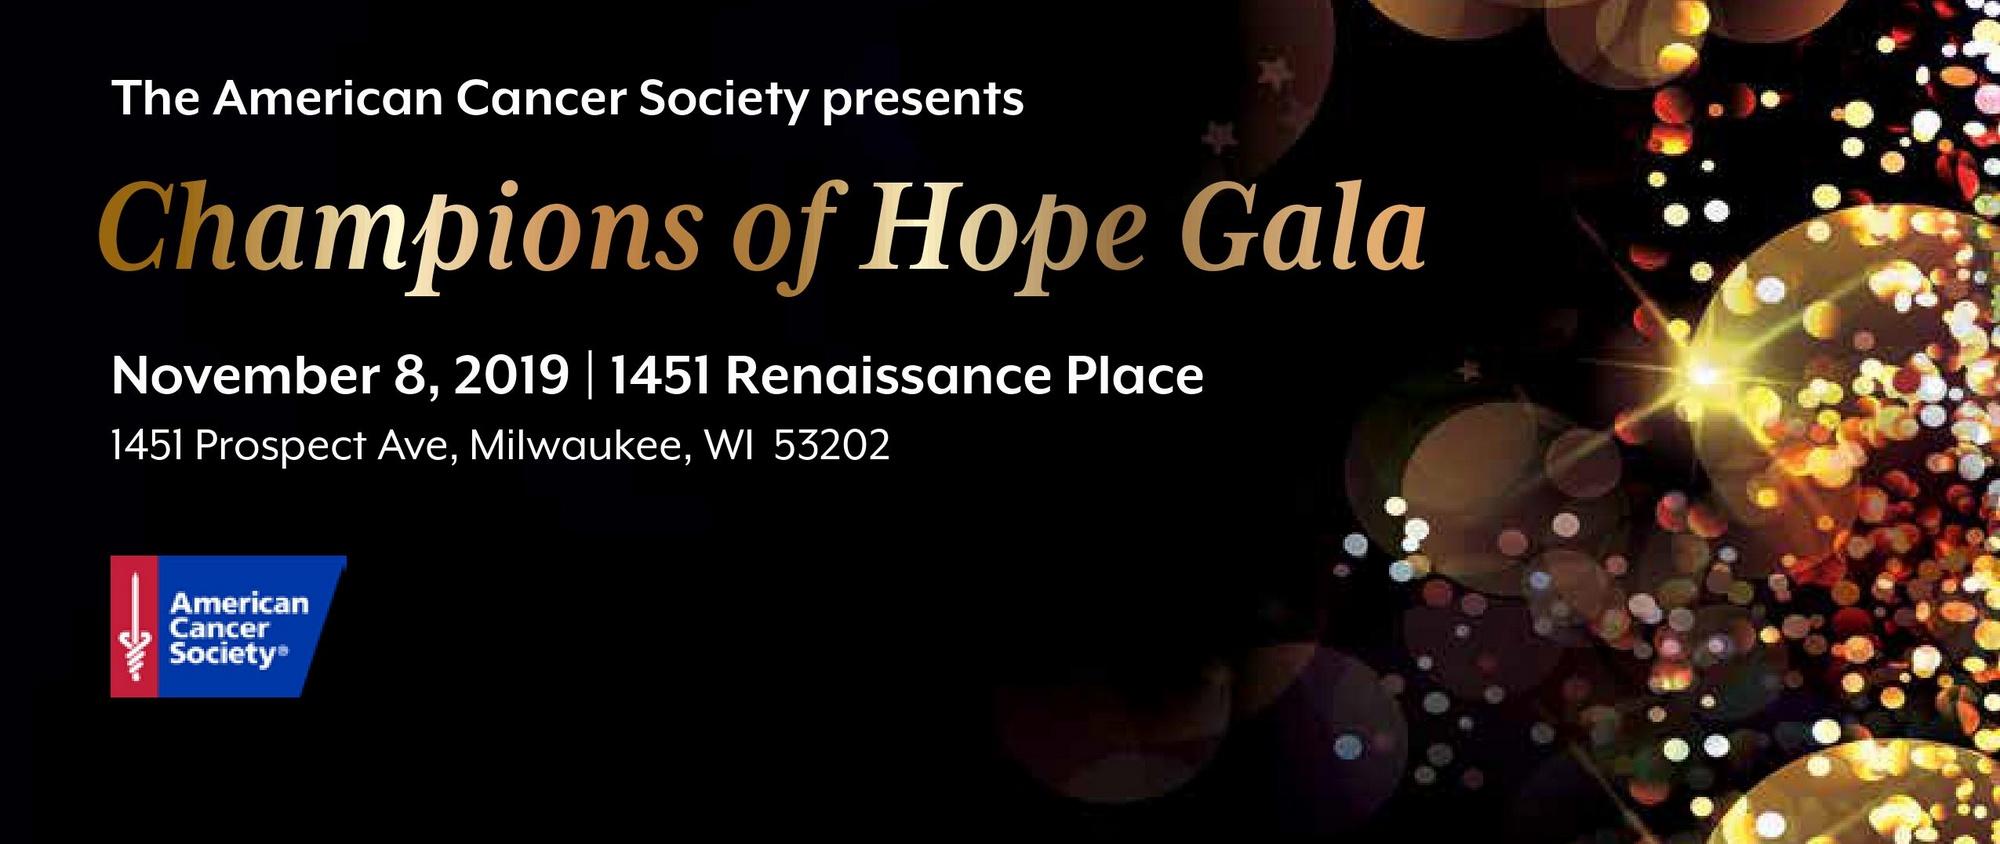 2019 Champions of Hope Gala